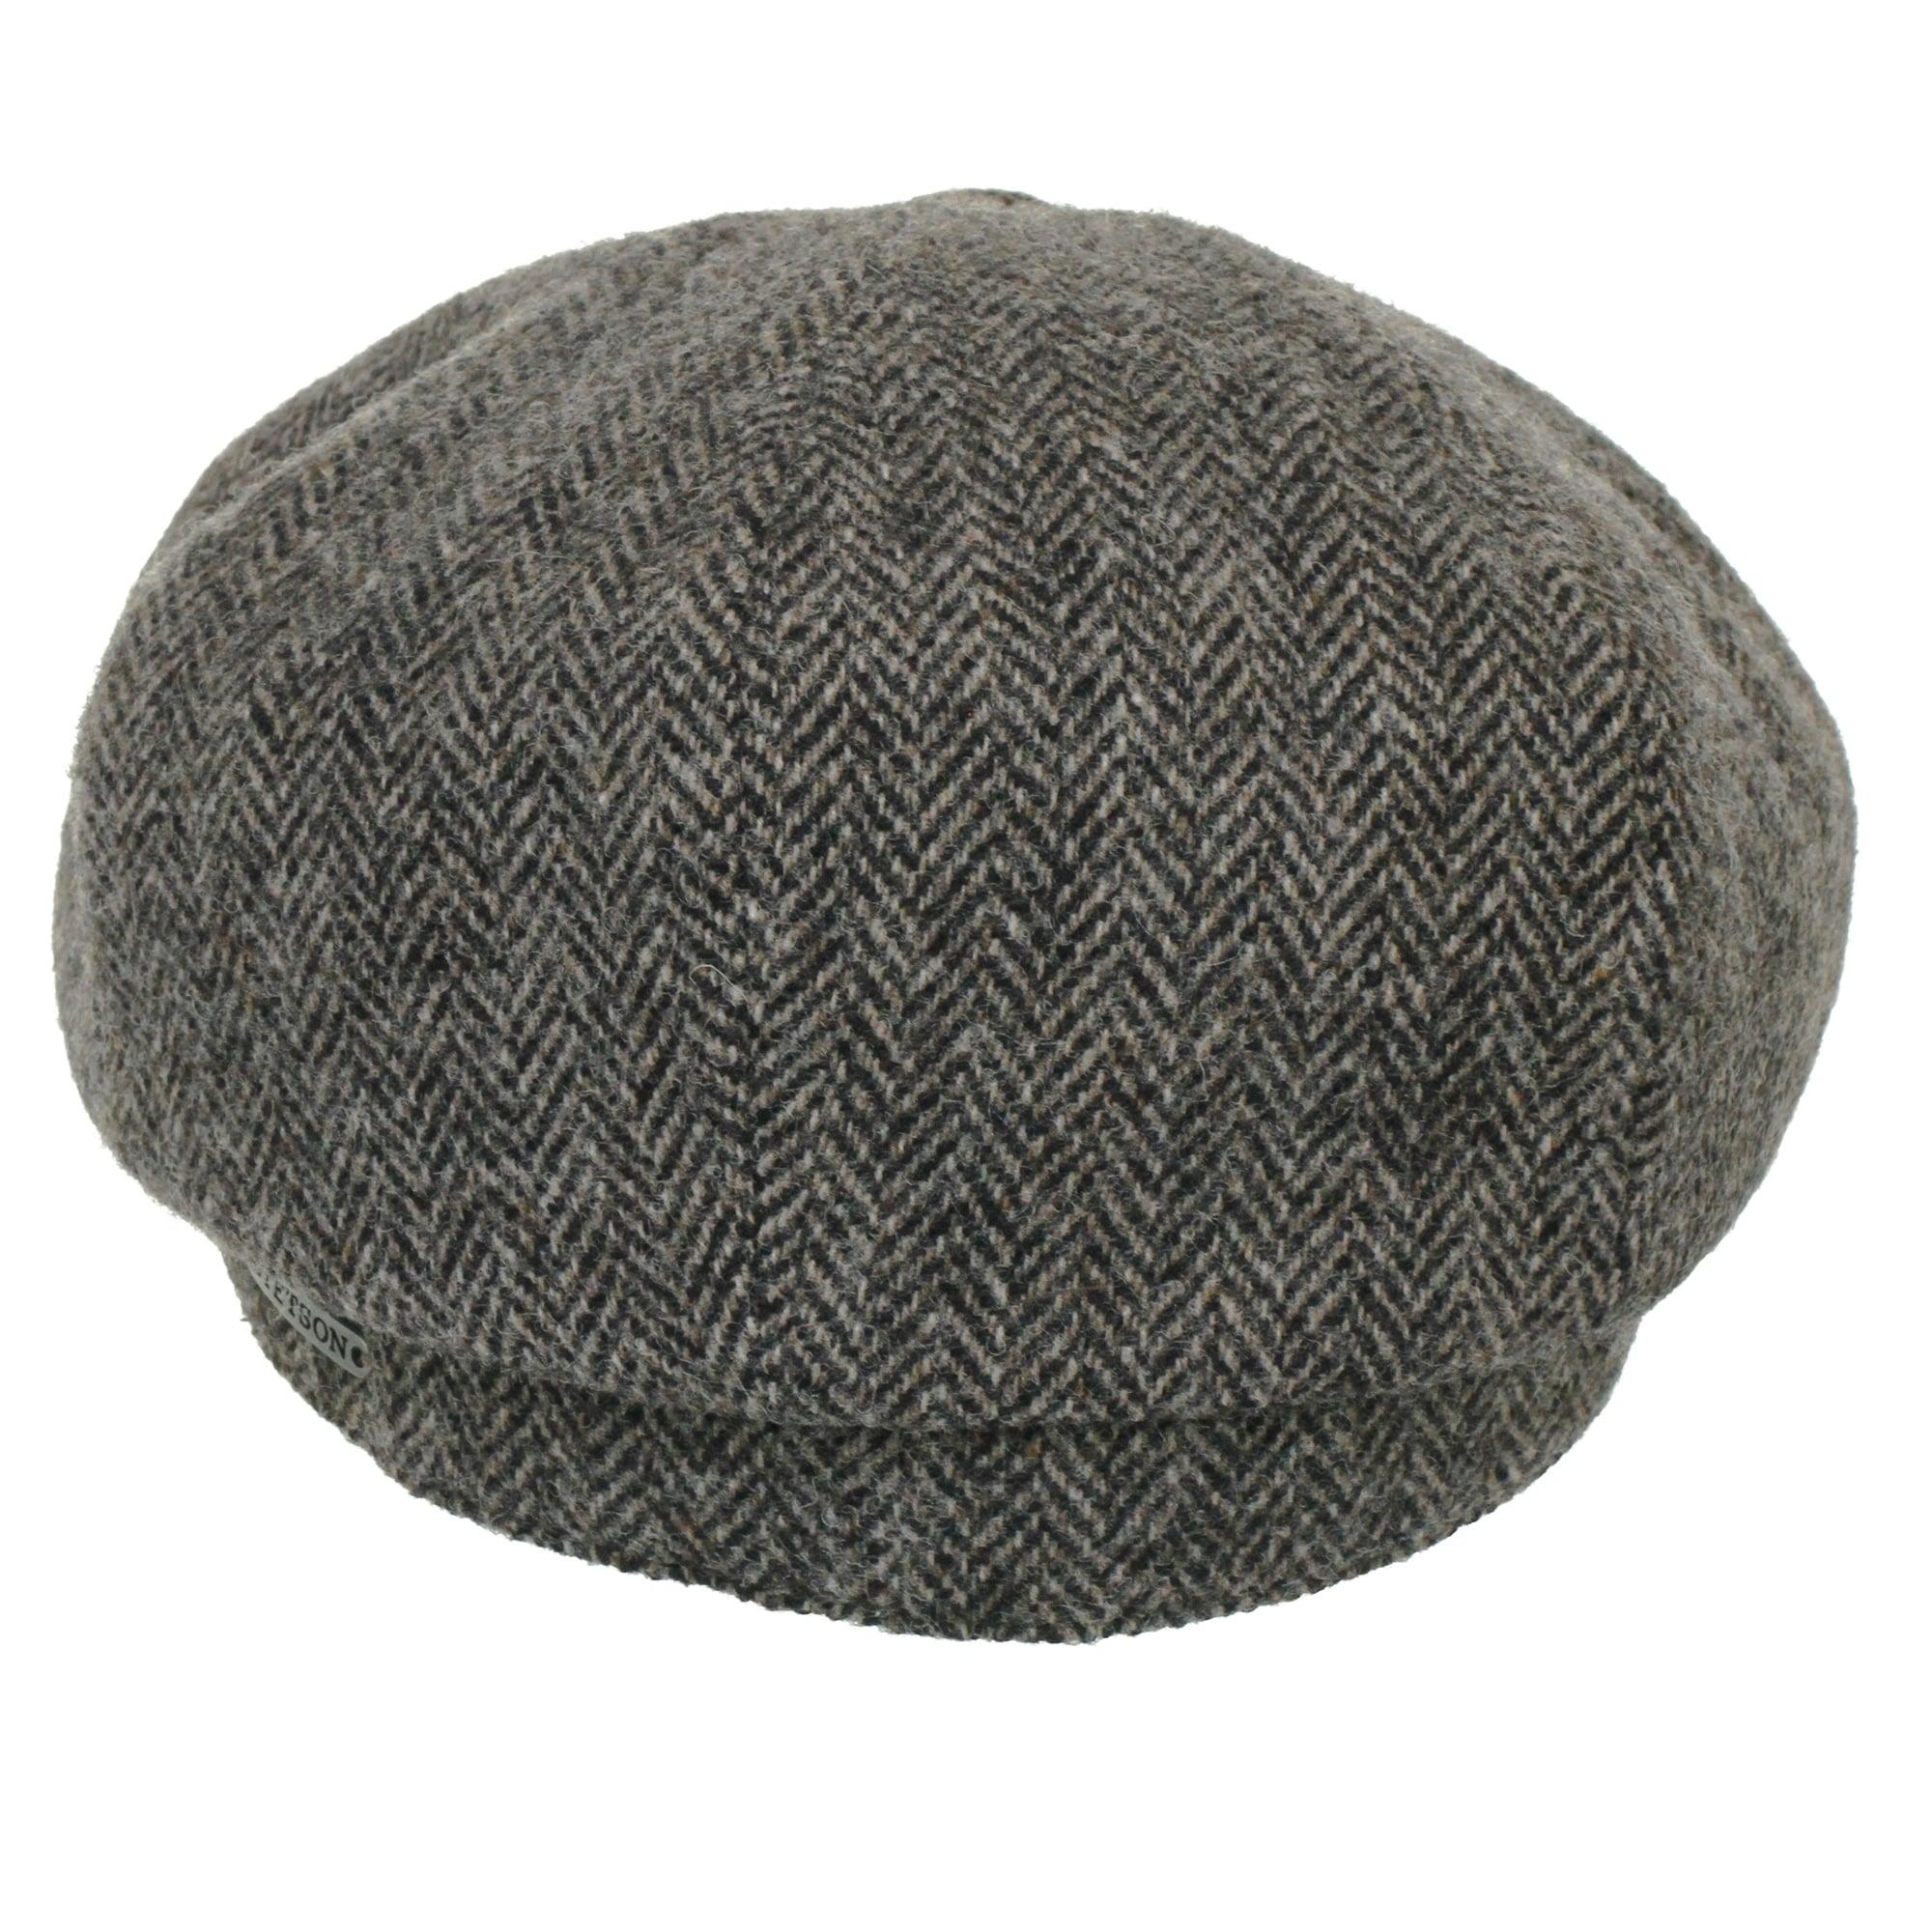 e1482ad1 Stetson Hatteras Woolrich Herringbone Grey Newsboy Hat 6840514 333